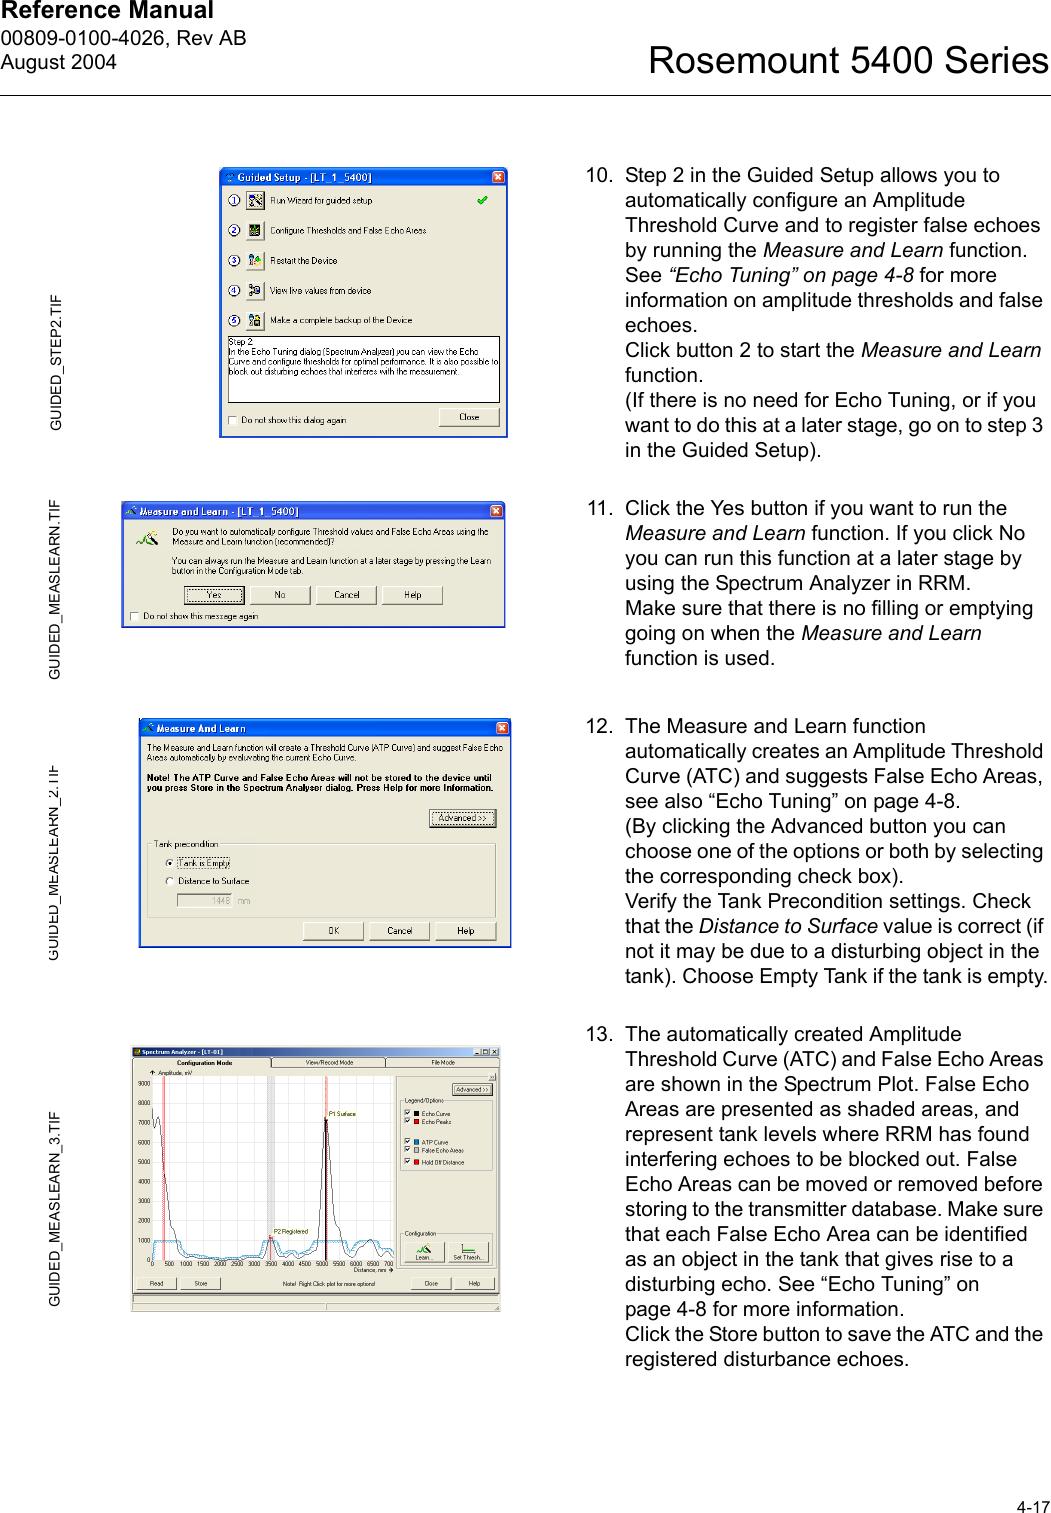 Emerson Rosemount Analytical 5301 Manual Guide